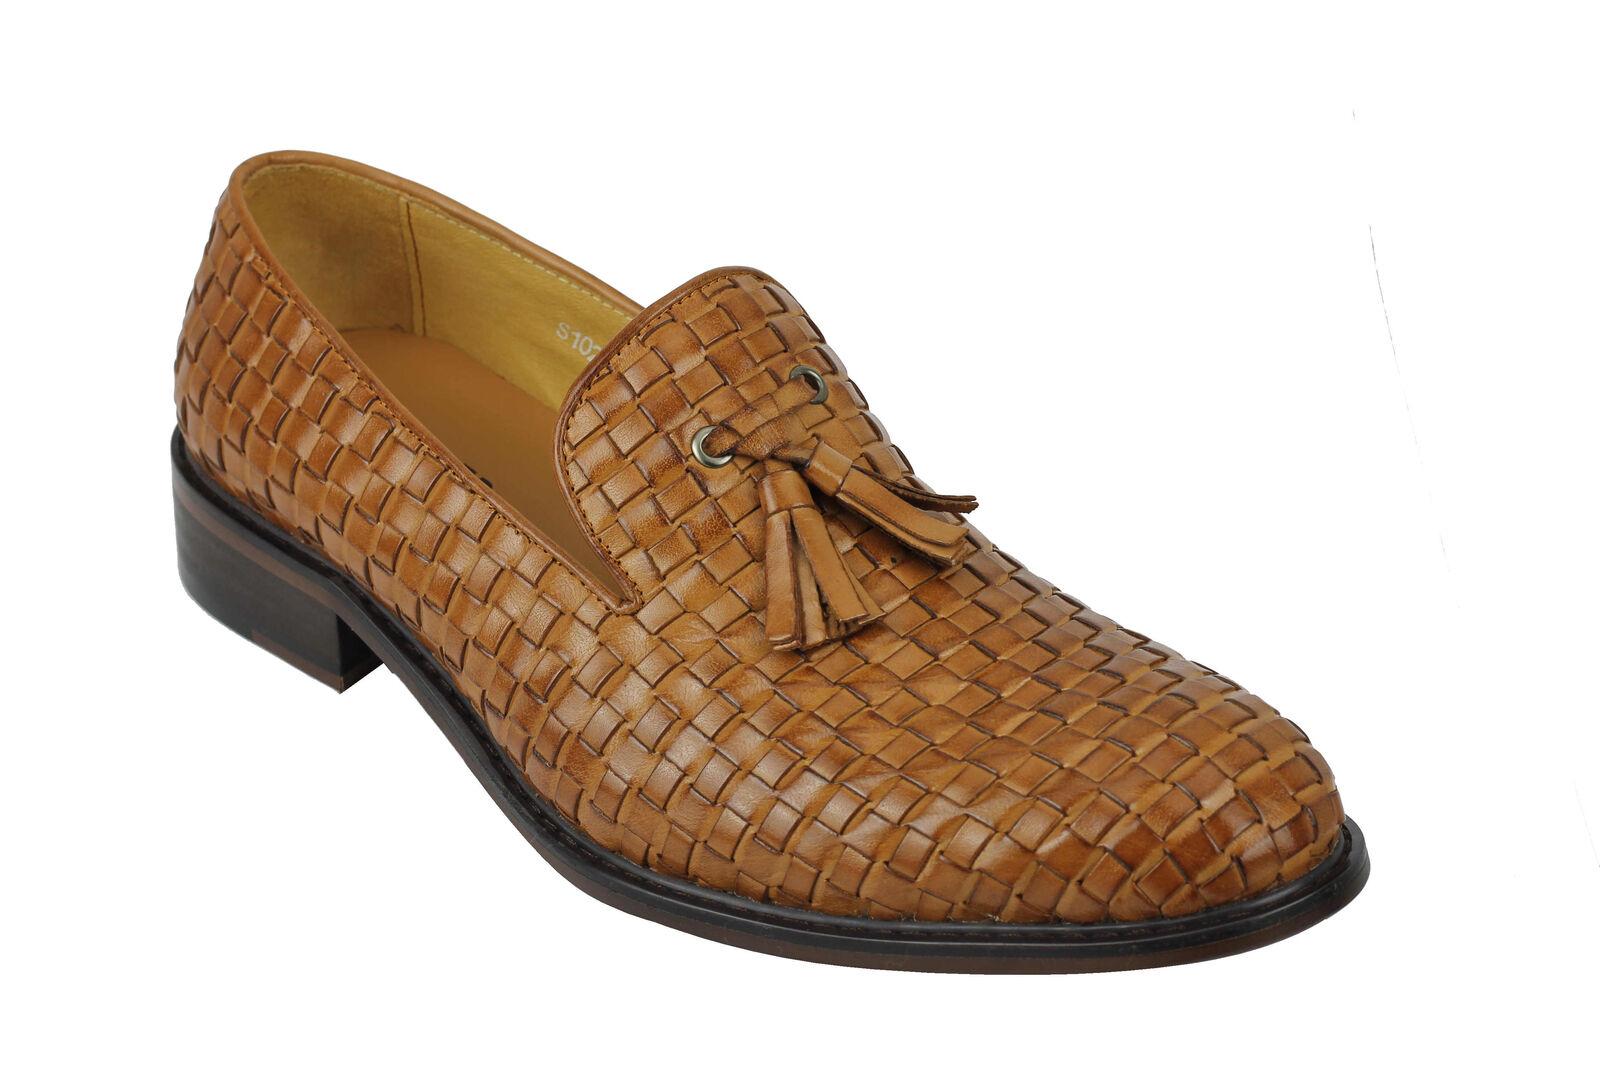 Uomo Real Vintage Handmade Tan Braun Real Uomo Leder Woven Tassel Loafers Slip on Schuhes e72df9